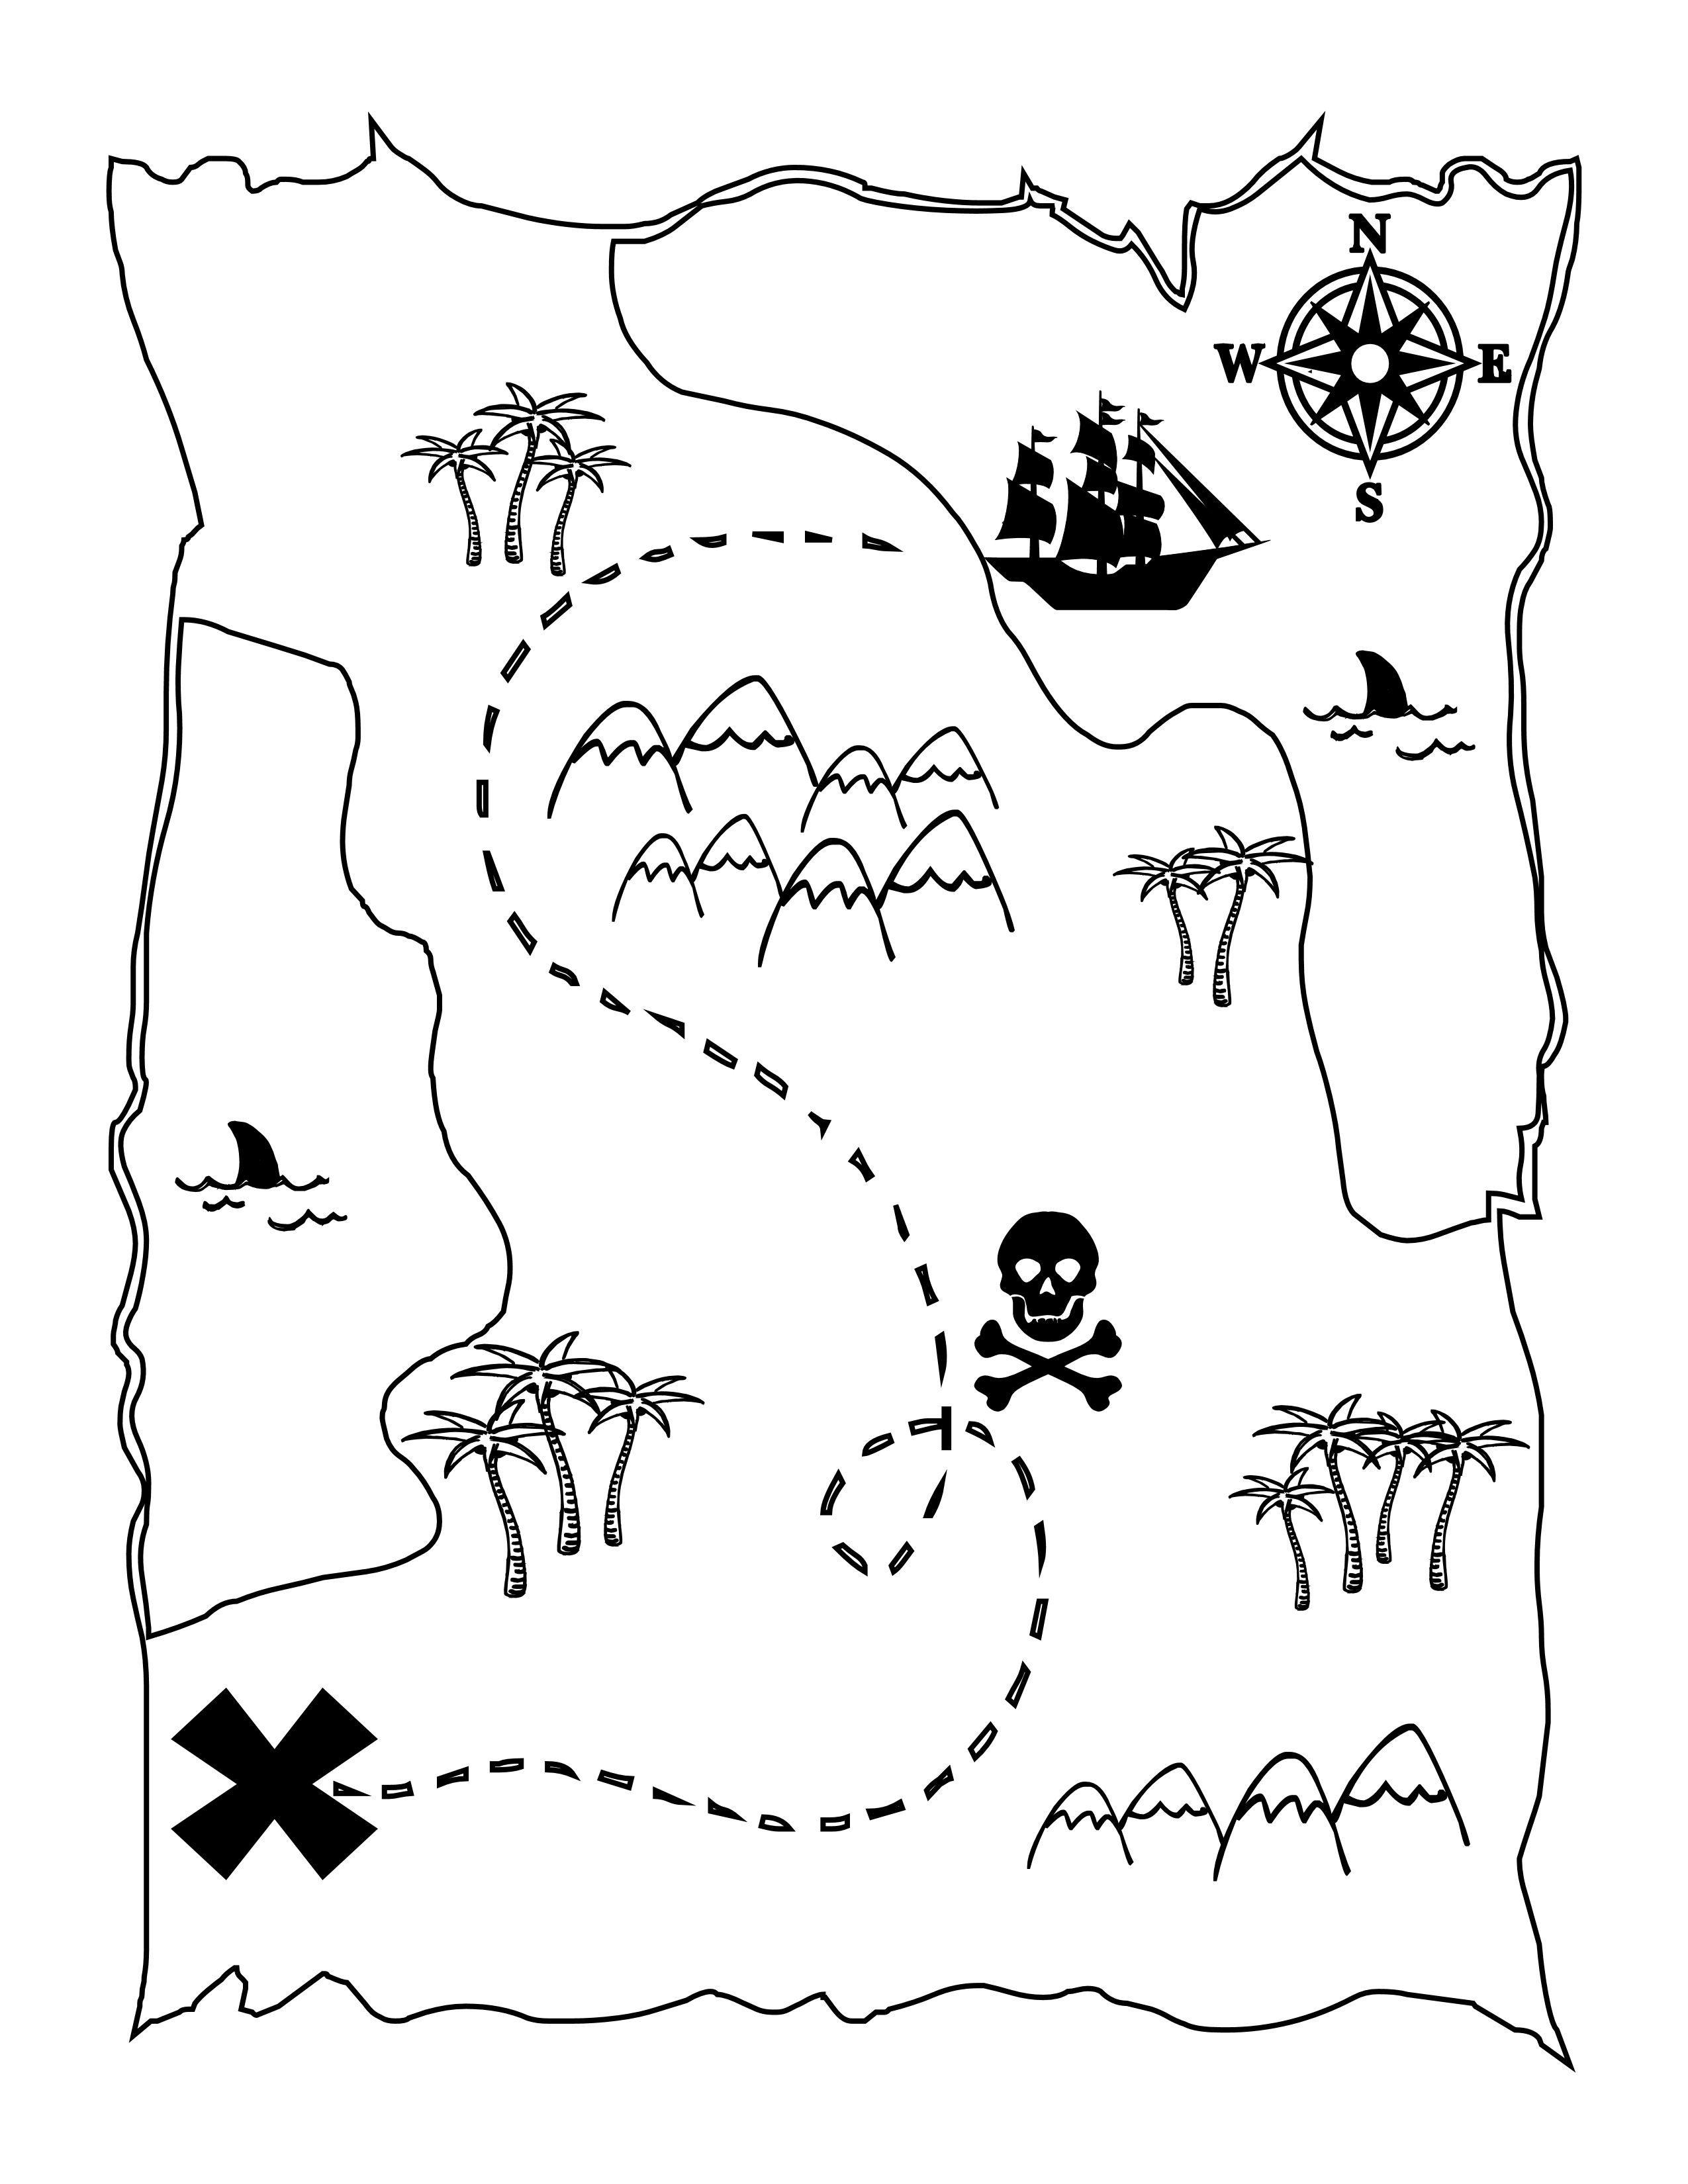 Printable Treasure Map Kids Activity | Printables | Pinterest - Free Printable Maps For Kids